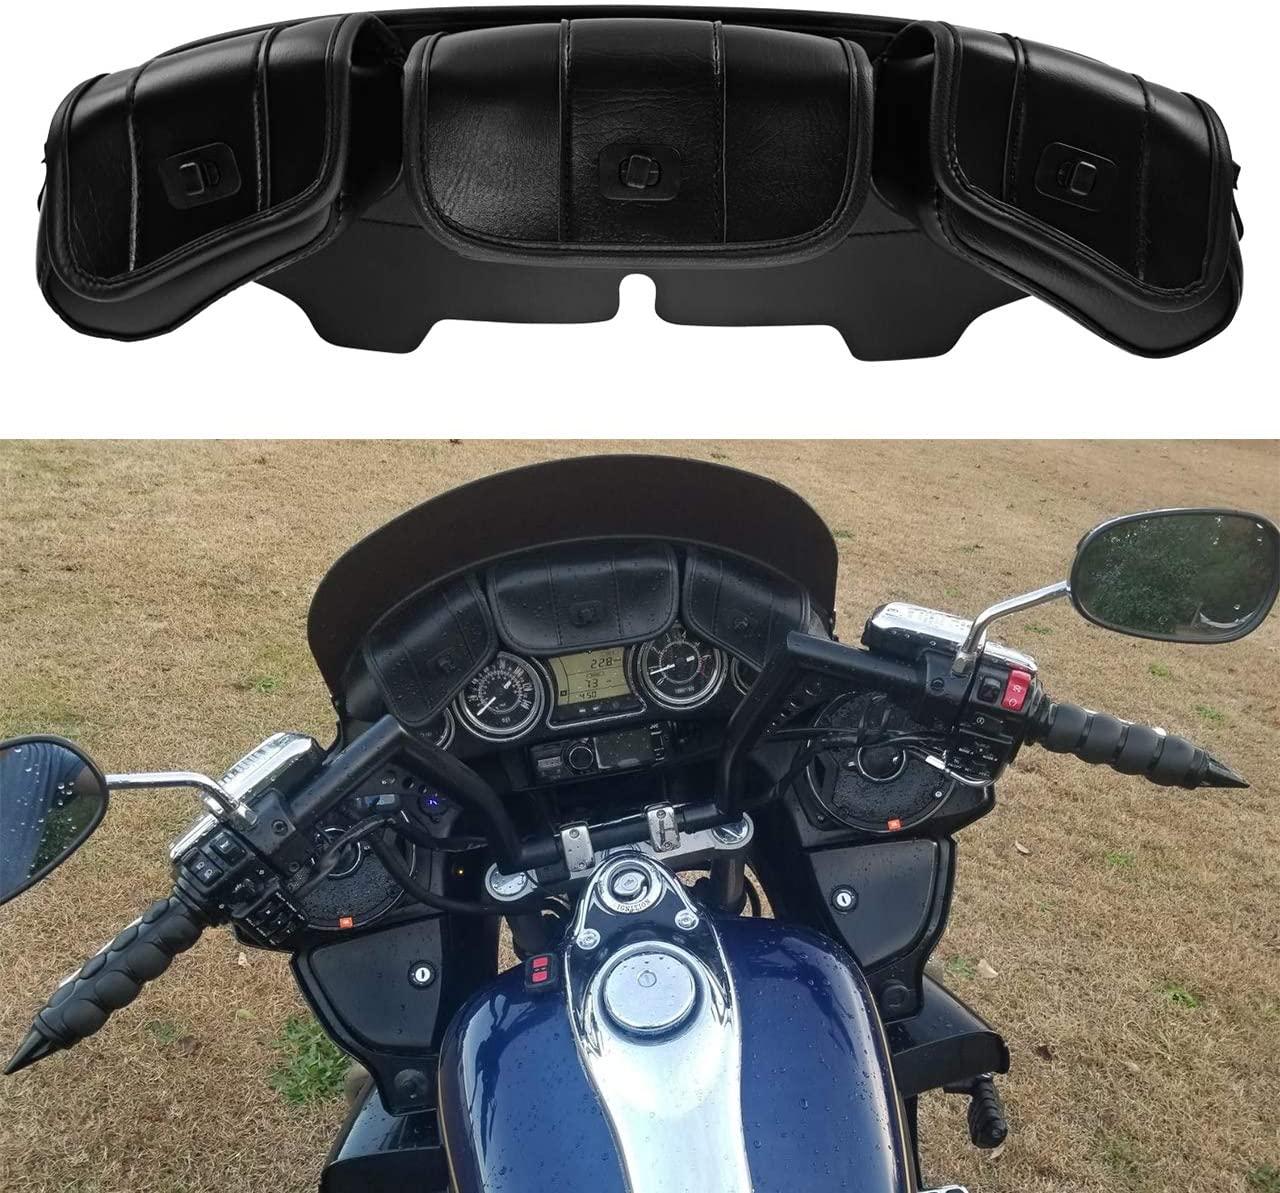 YHMTIVTU Windshield Saddle Pouch Bag Fits for Harley Touring Electra Street Glide Trike Models FLHT FLHTC FLHX FLHTK FLHTCU FL Trike 1996-2013